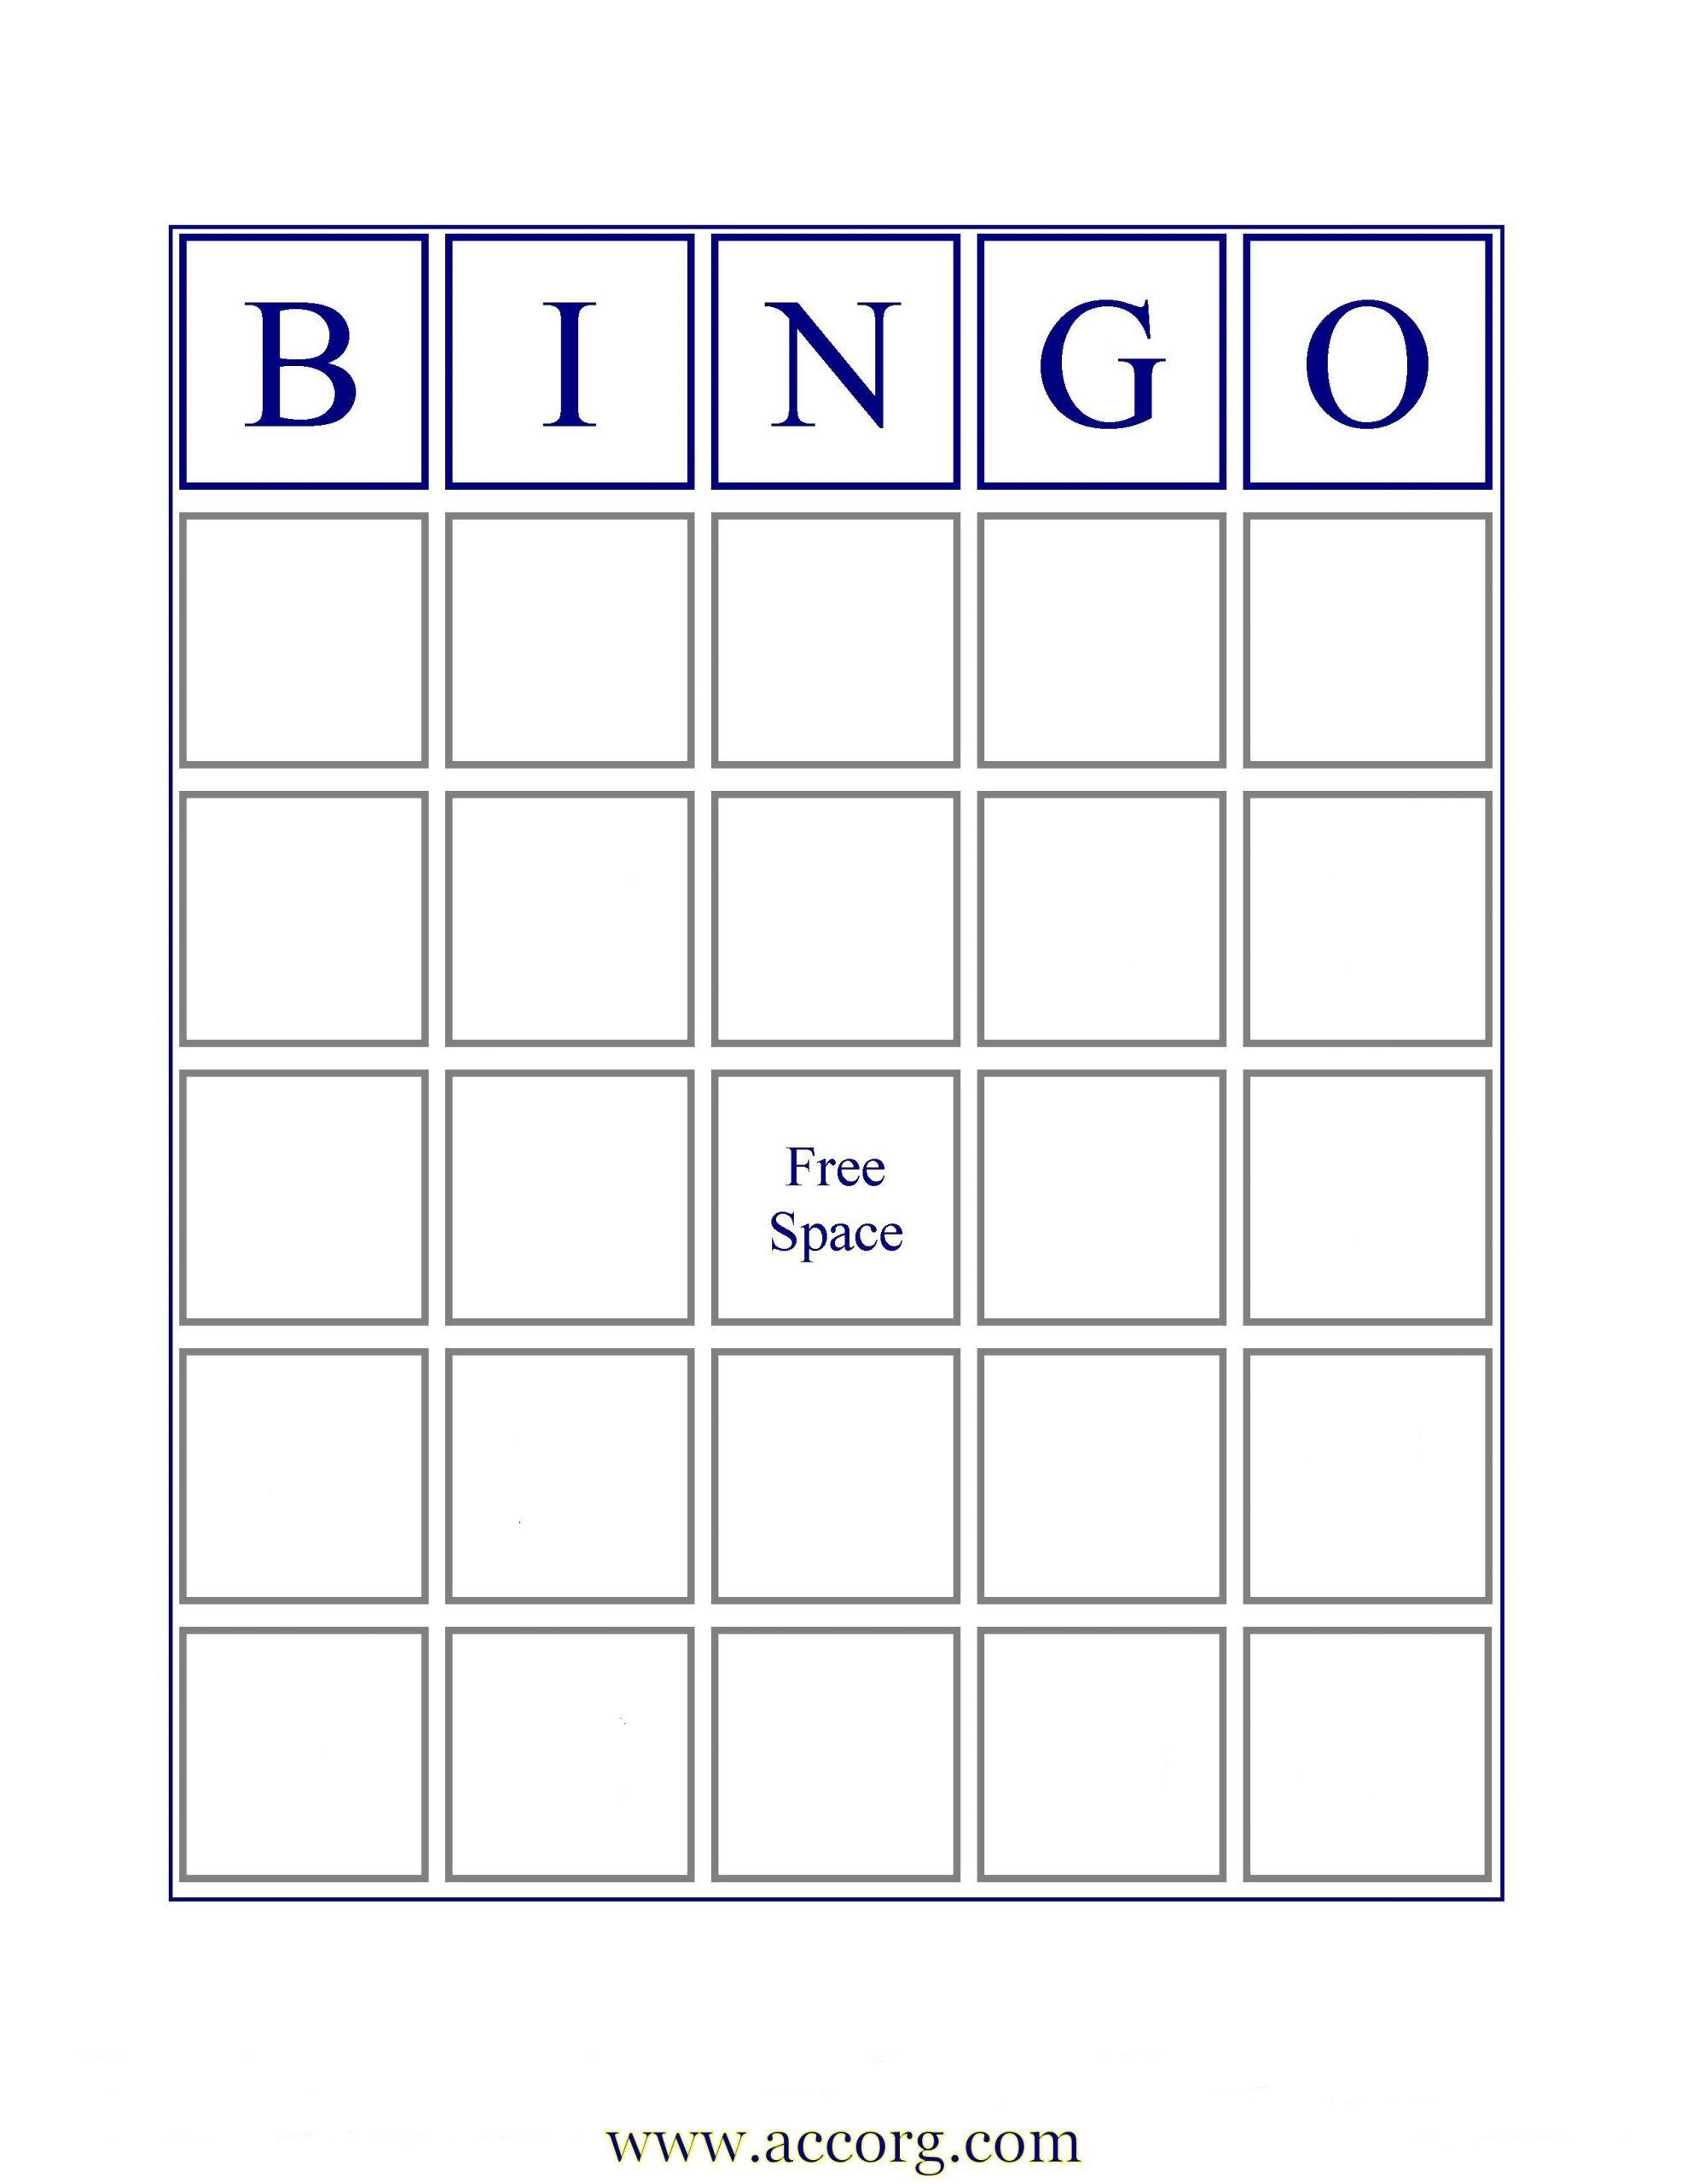 Blank Bingo Cards | If You Want An Image Of A Standard Bingo